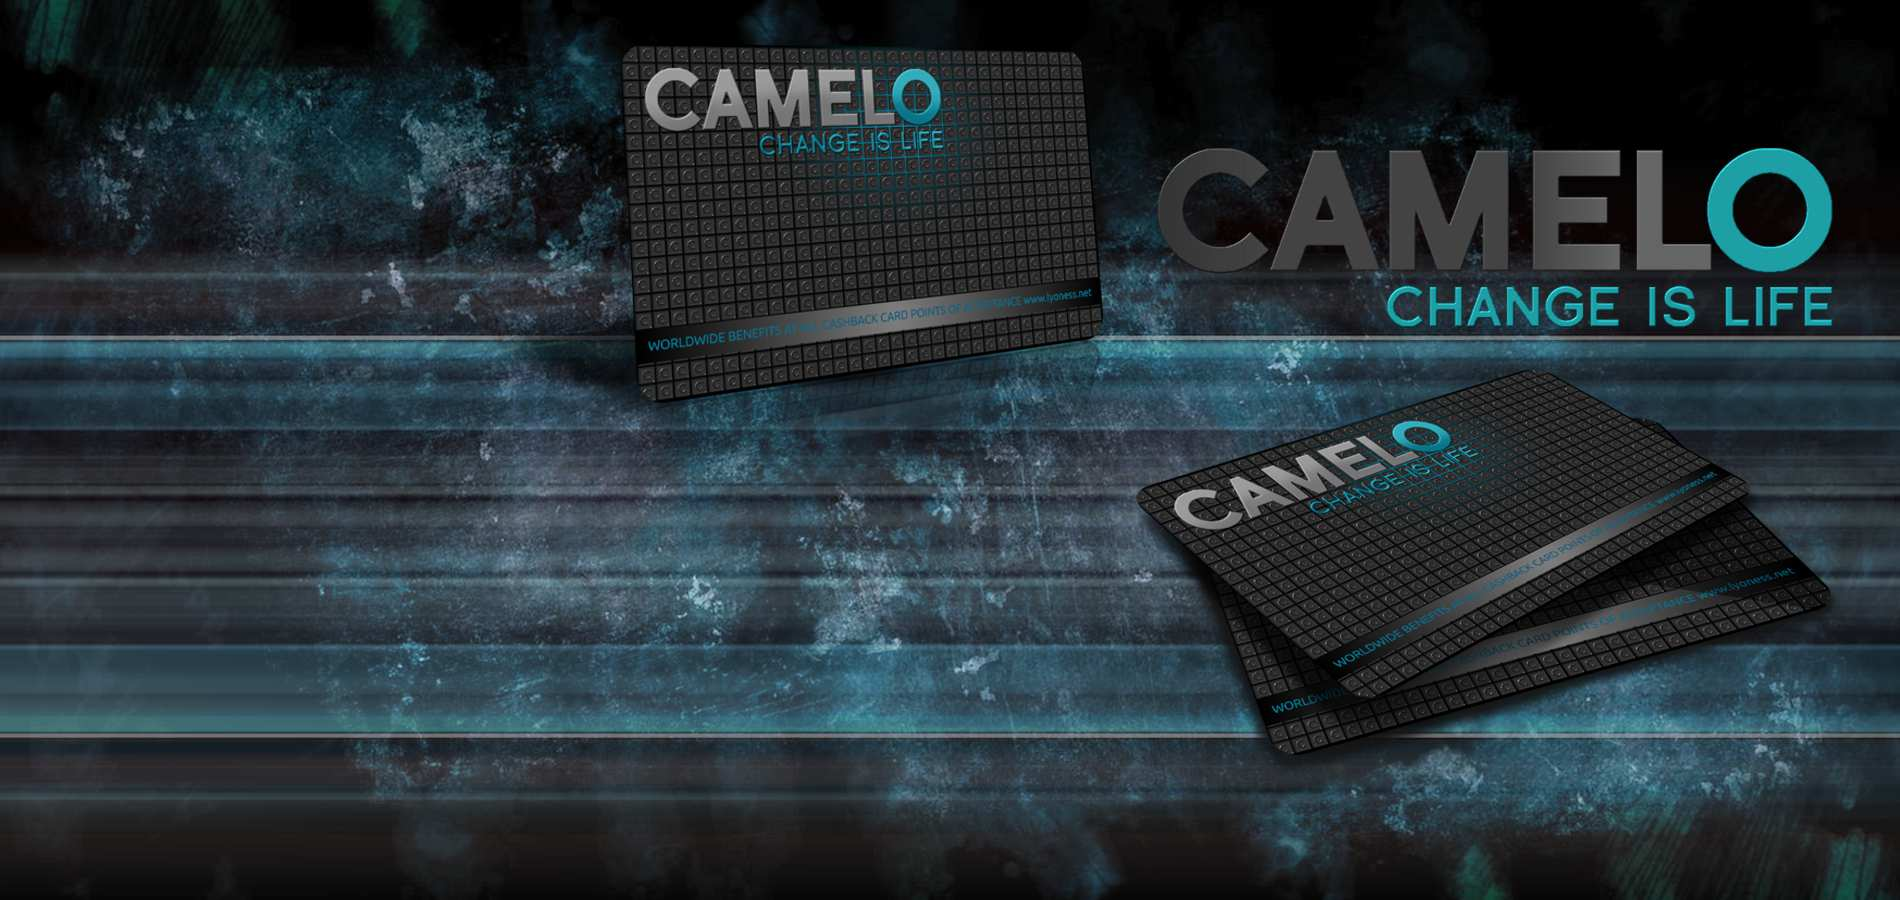 camelo-slider-1900×900-lyoness (2)